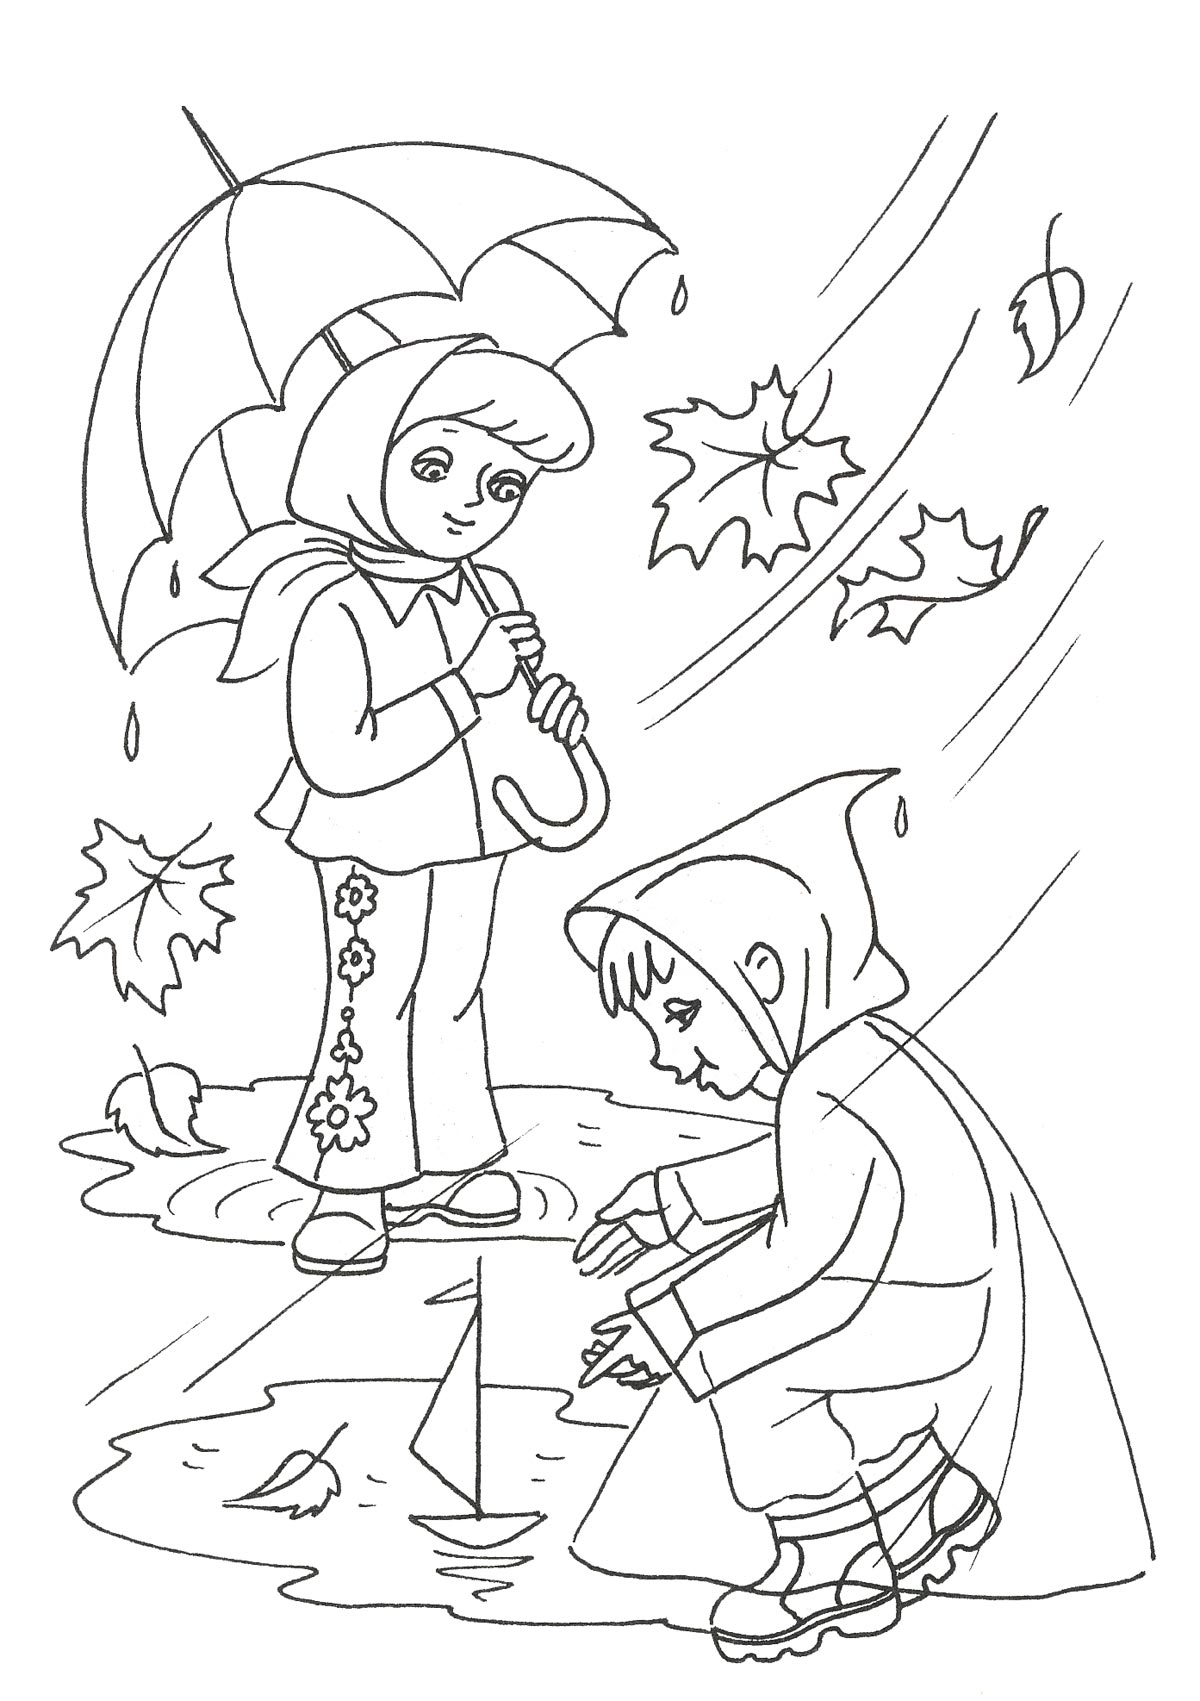 Раскраски на тему осень - 10